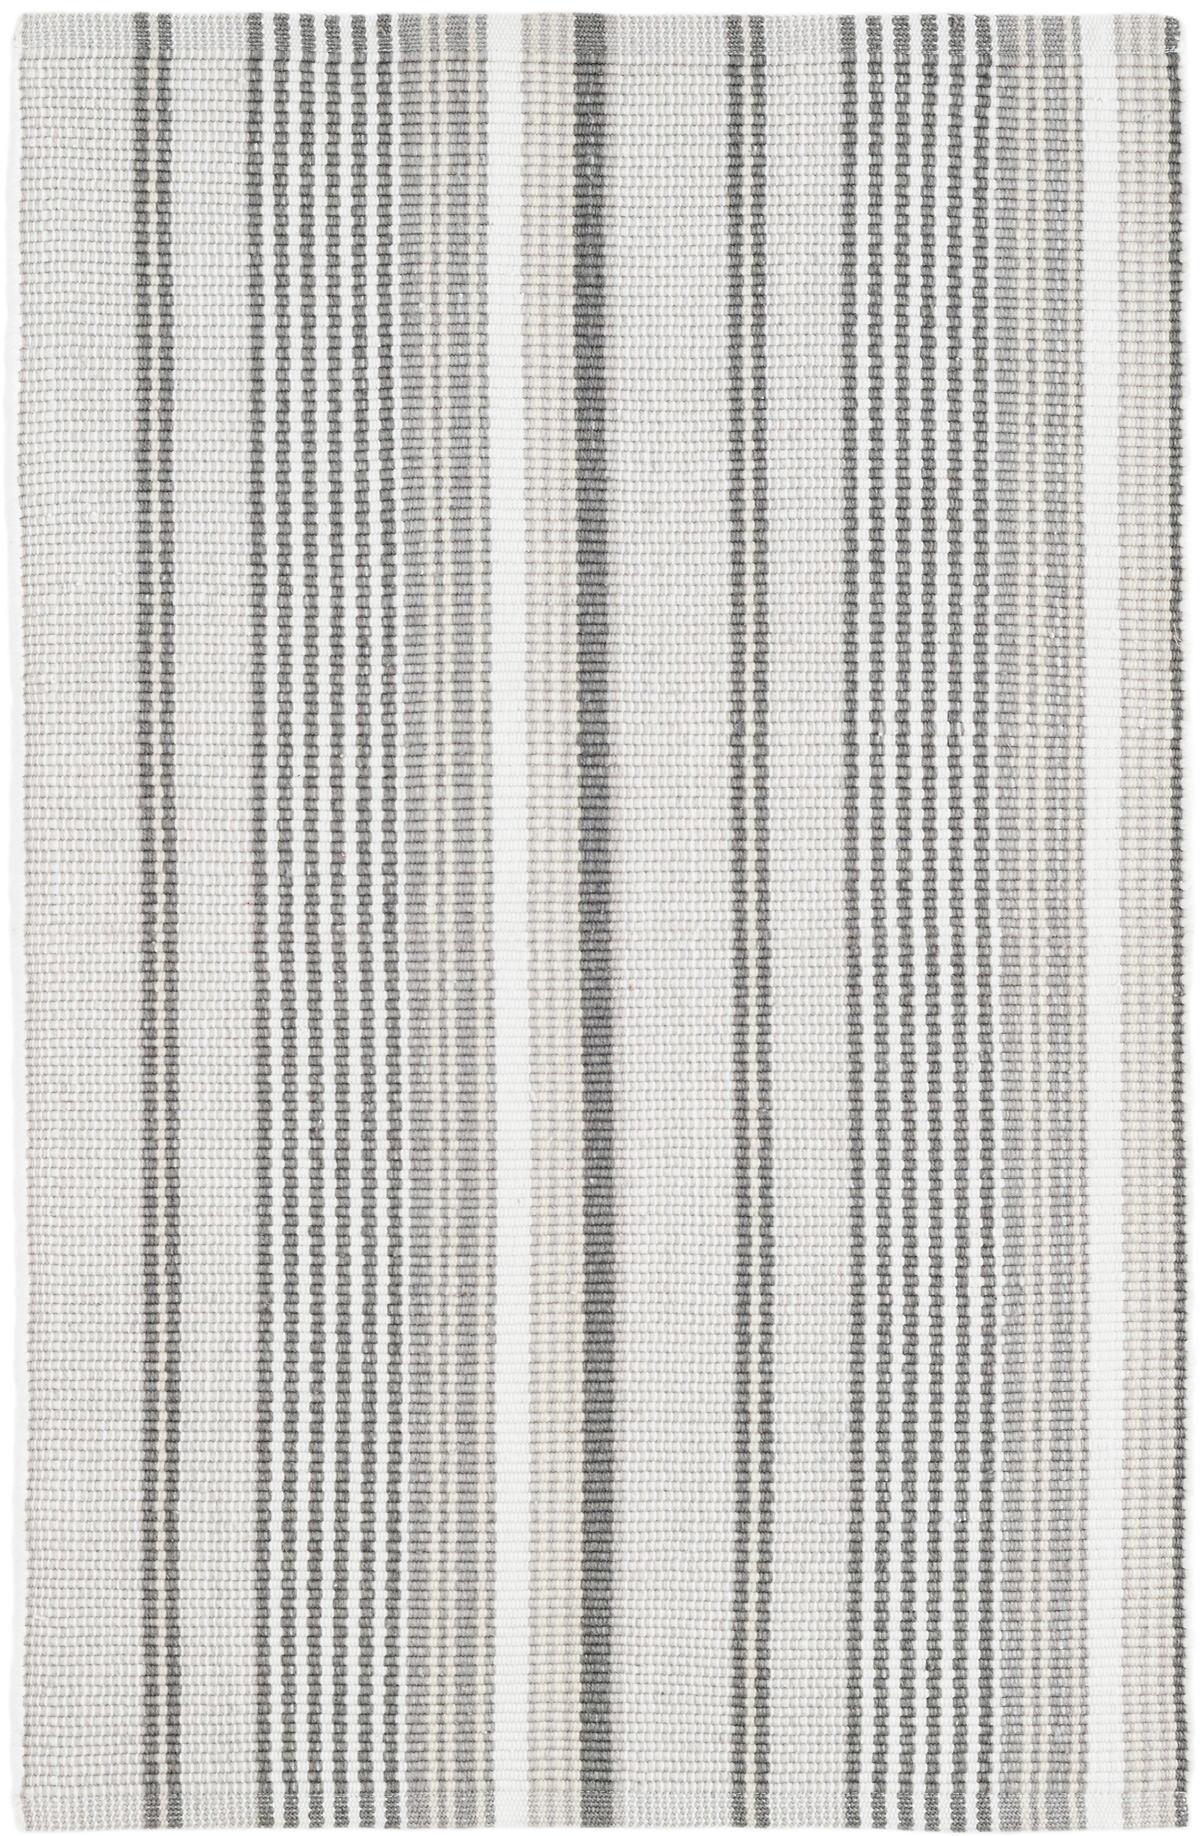 Gradation Ticking Woven Cotton Rug